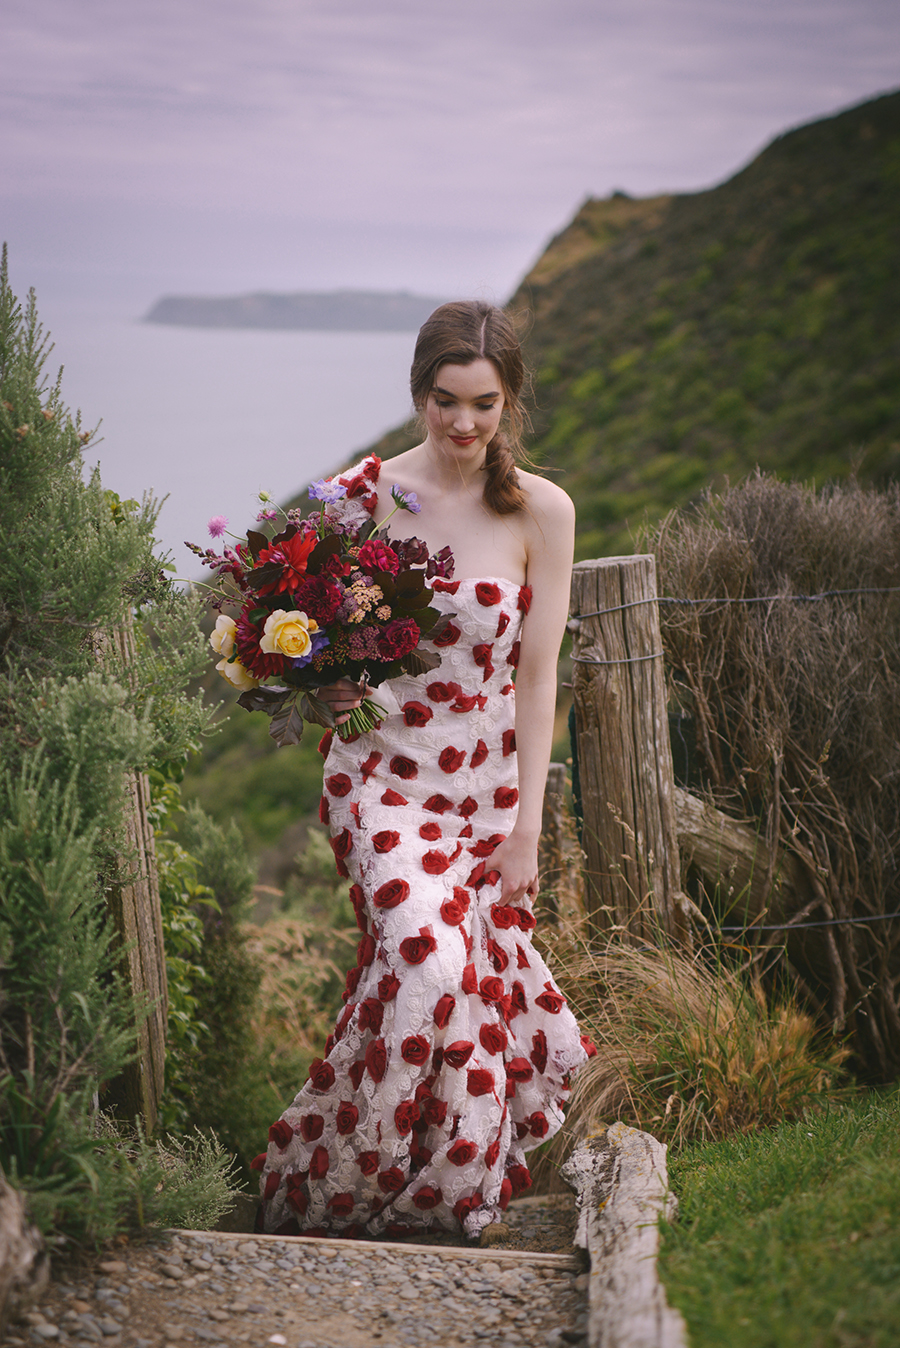 Well+Travelled+Bride+Wellington+Elopement (3).jpeg